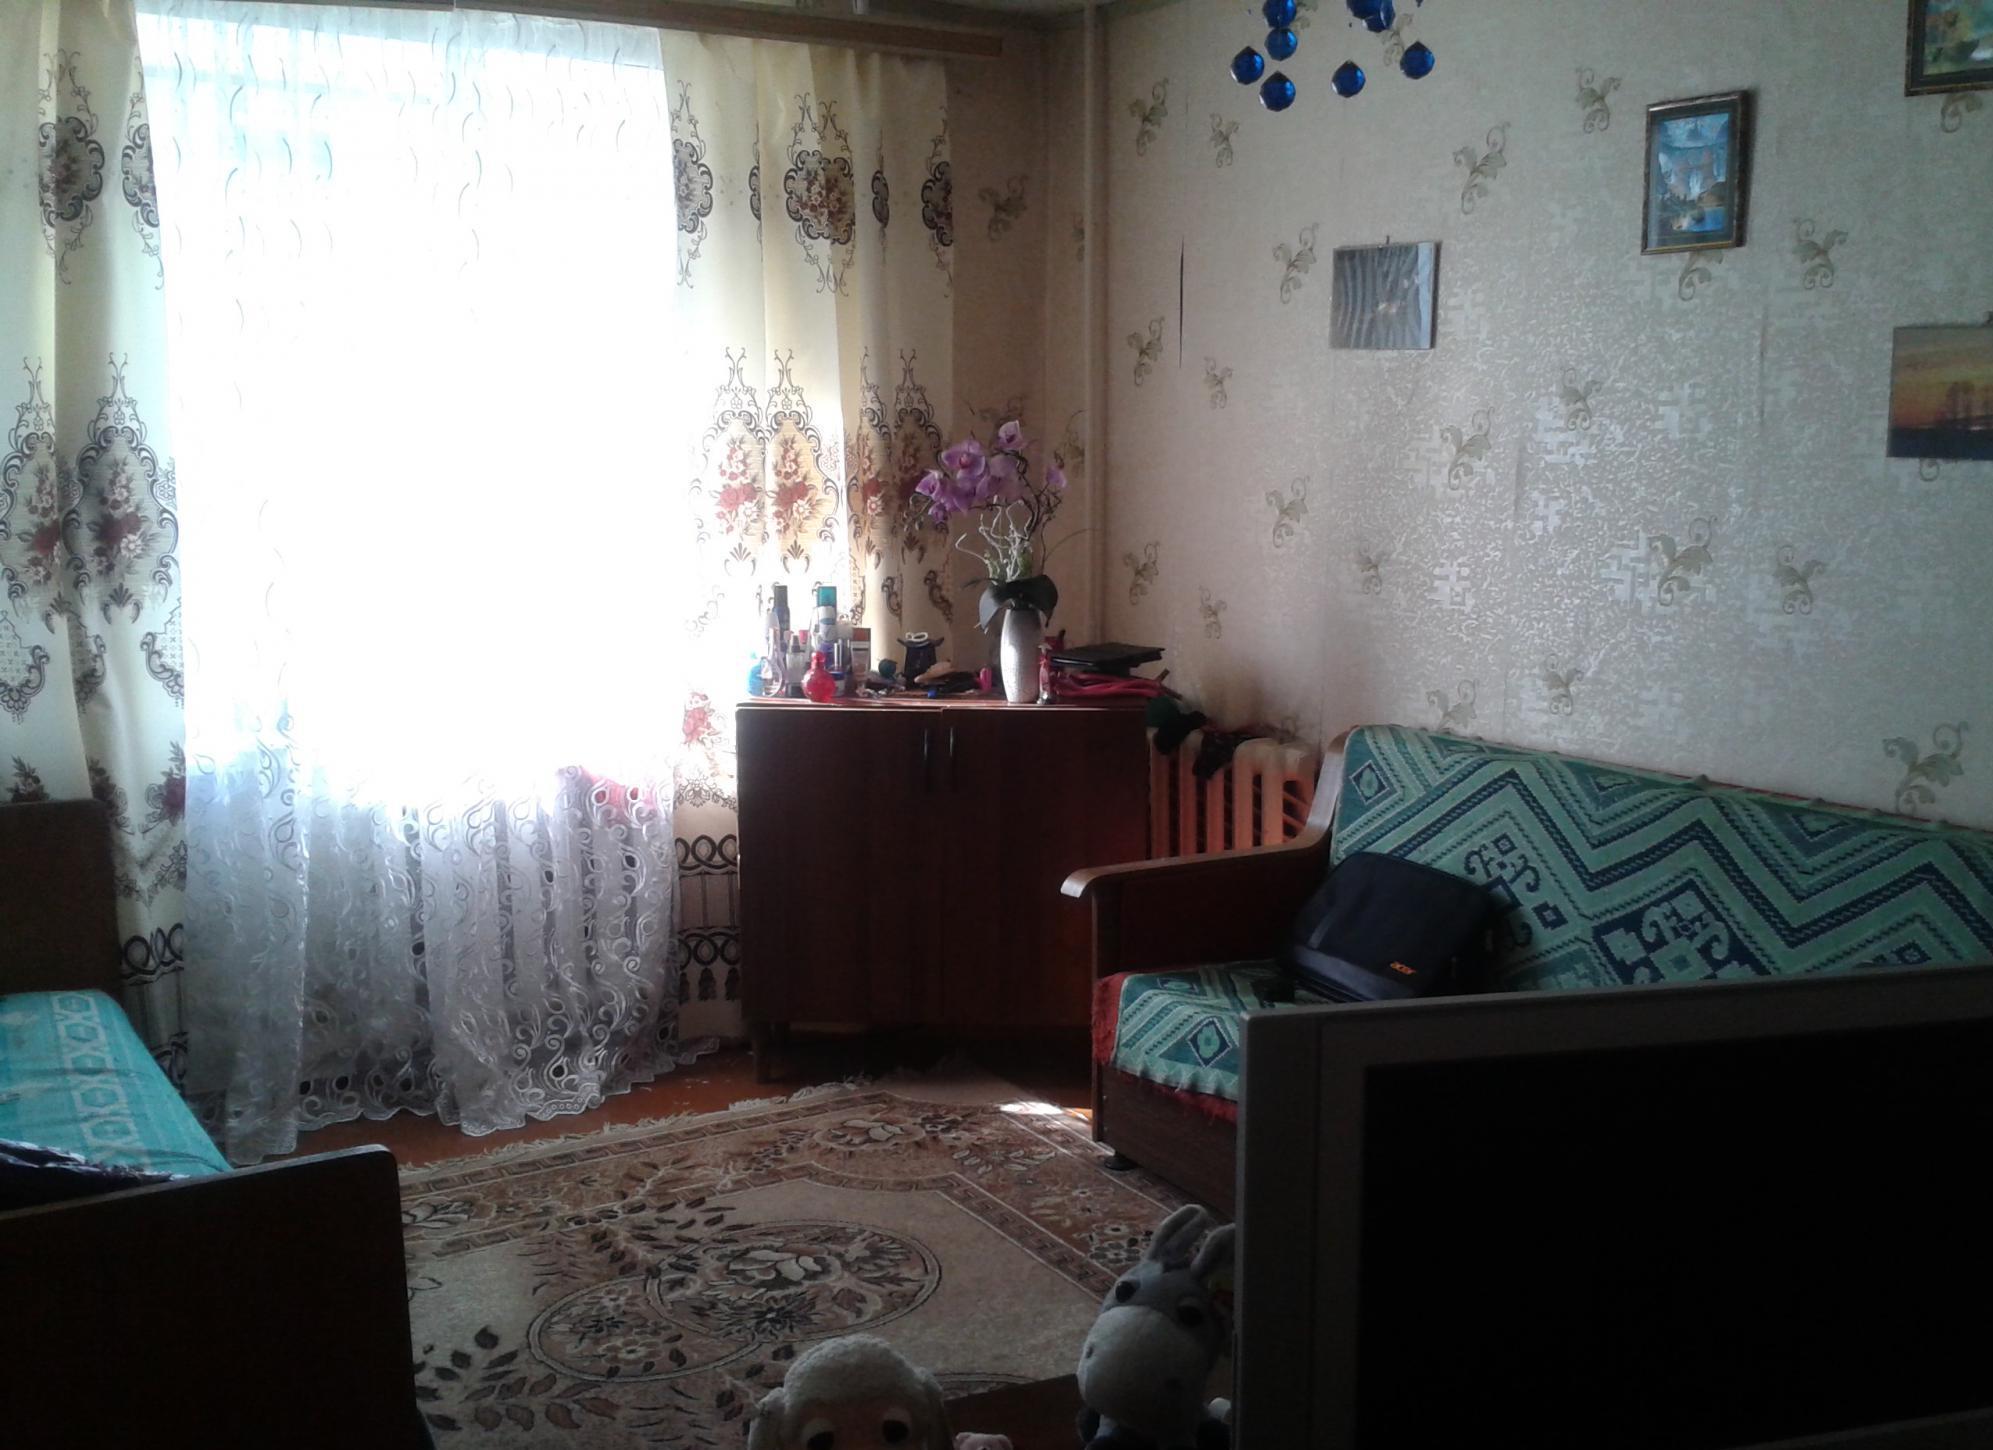 2-к квартира | Краснодар, Кирова, р-н ЦМР, 37 фото - 1